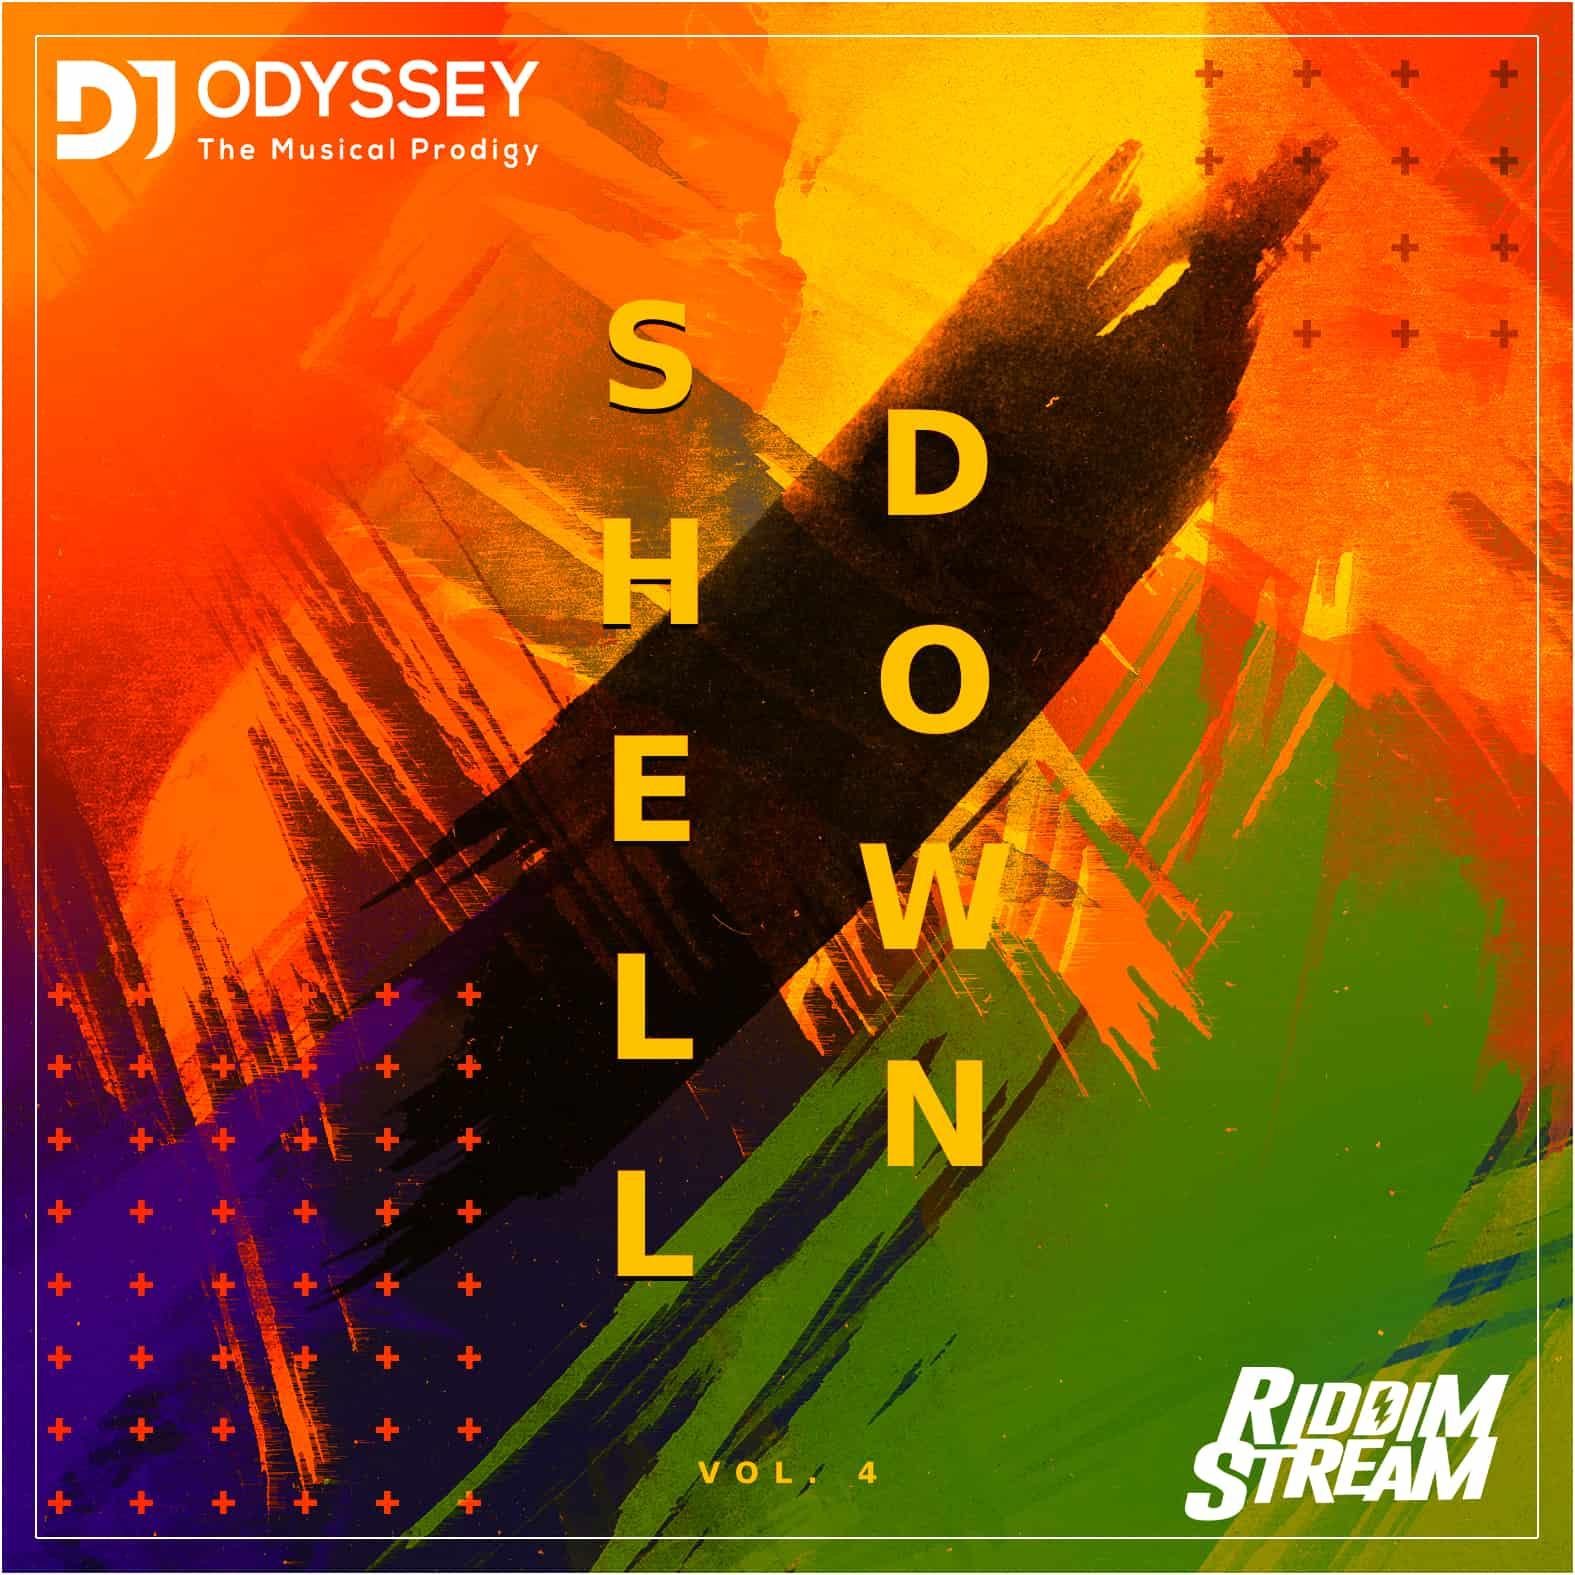 DJ Odyssey - Shell Down Vol 4 Mixtape